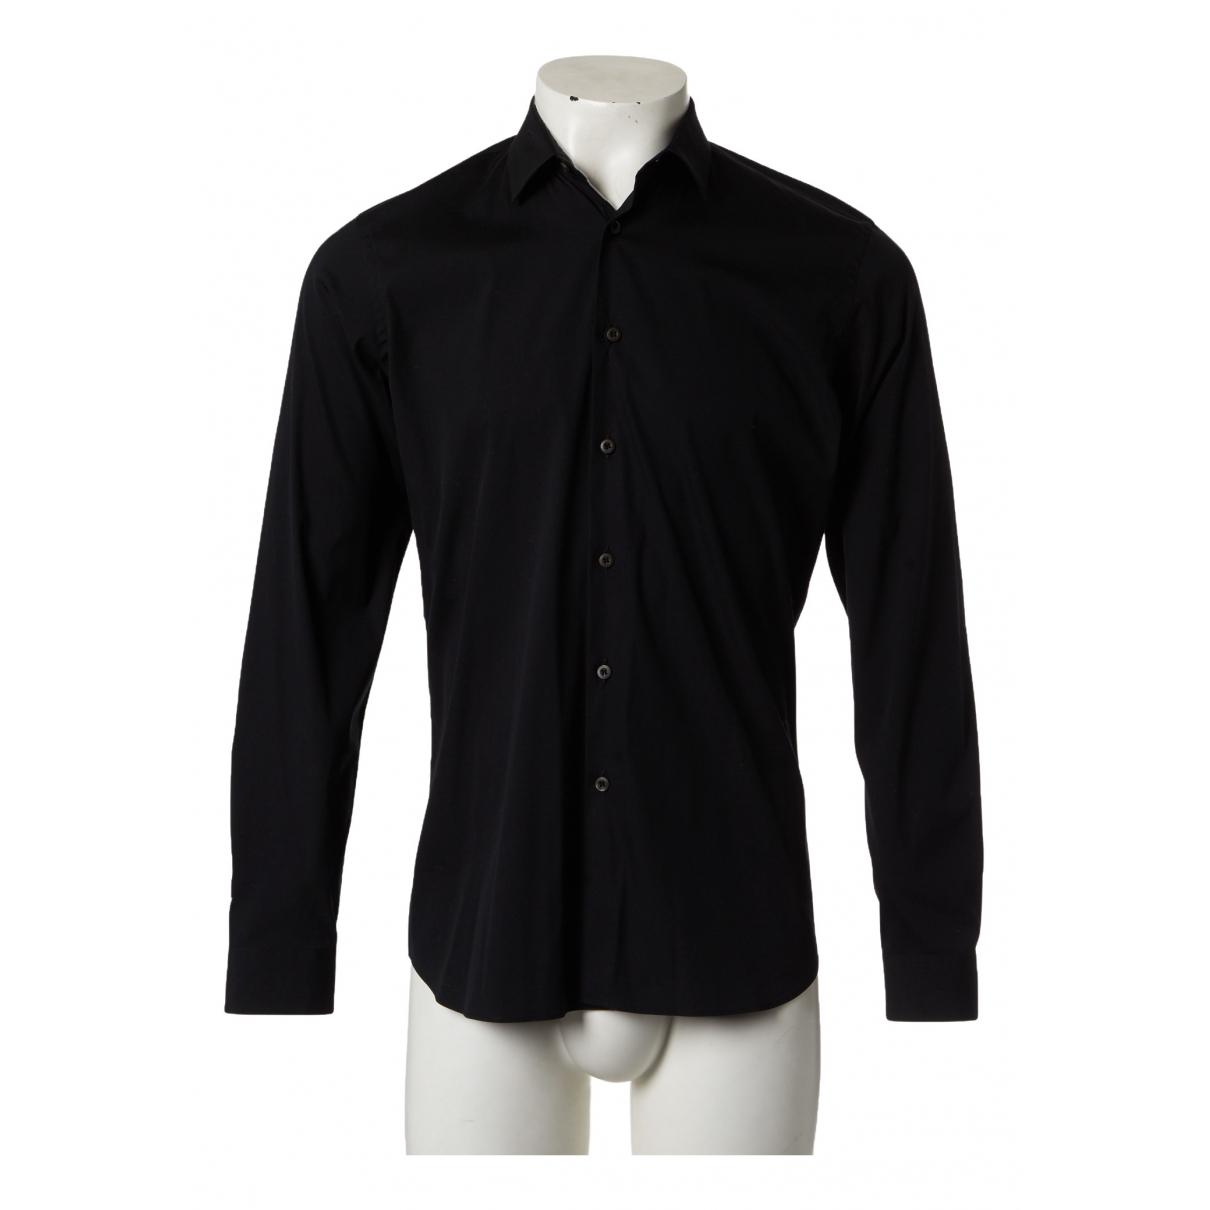 Prada N Black Cotton Shirts for Men 39 EU (tour de cou / collar)